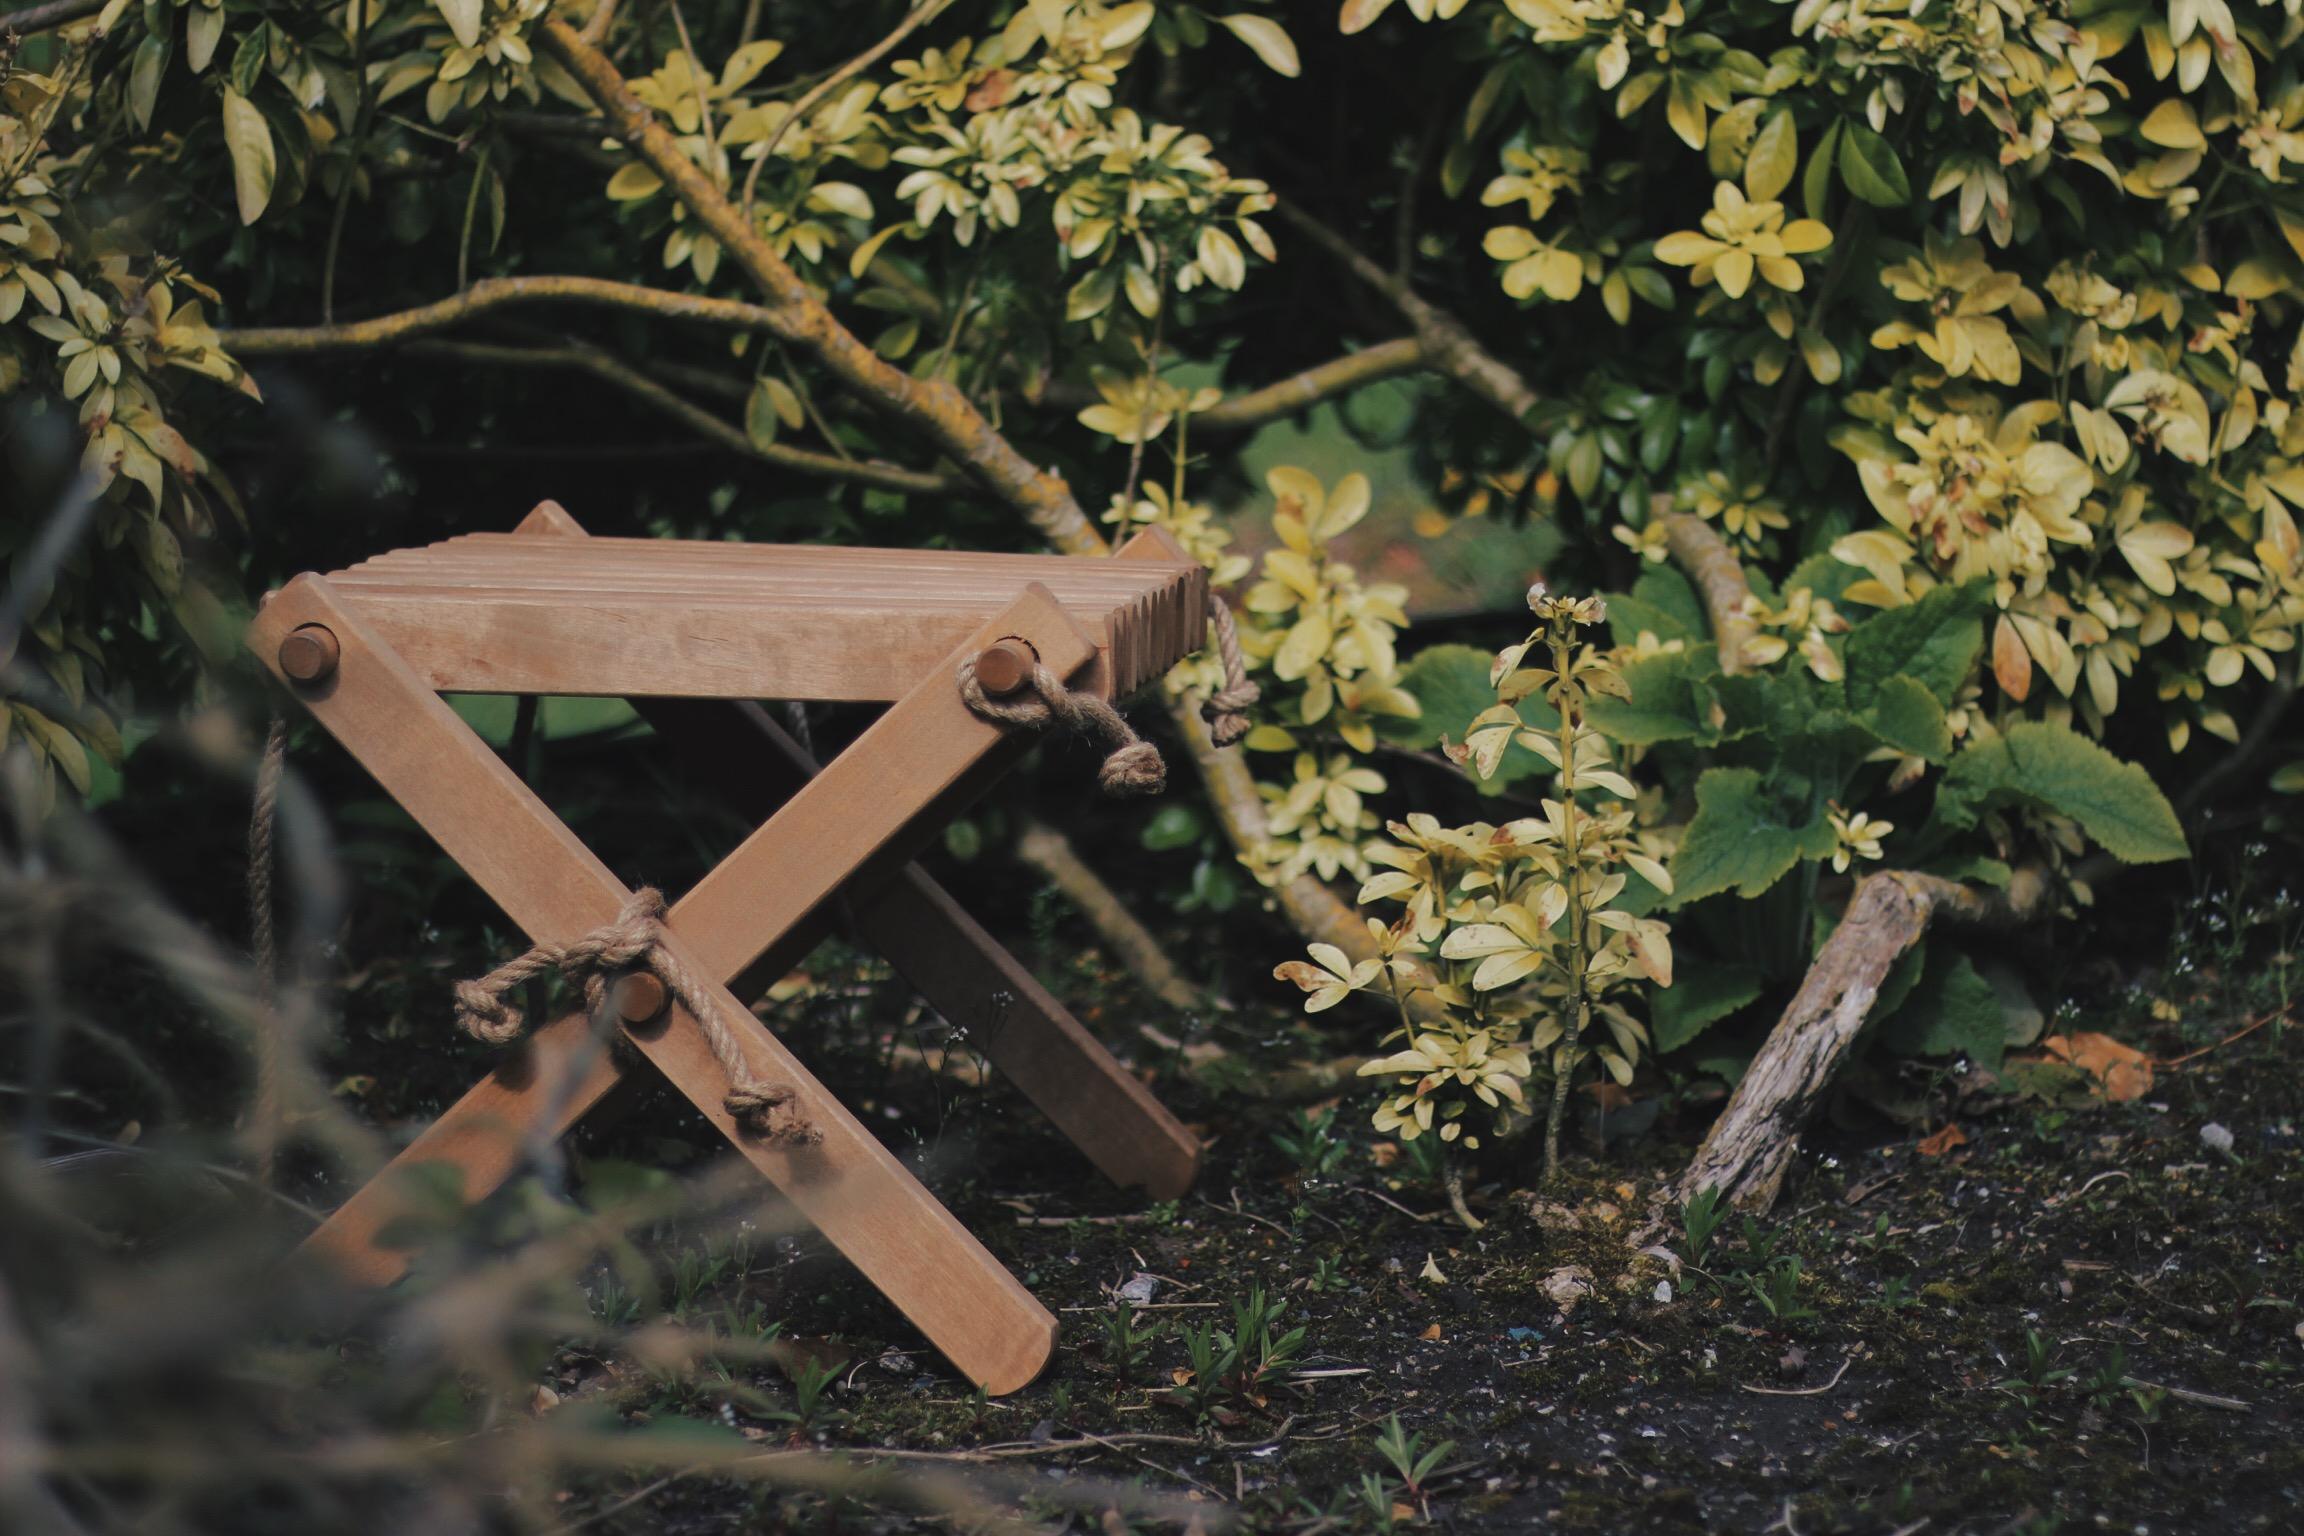 Wooden Stool in the Garden